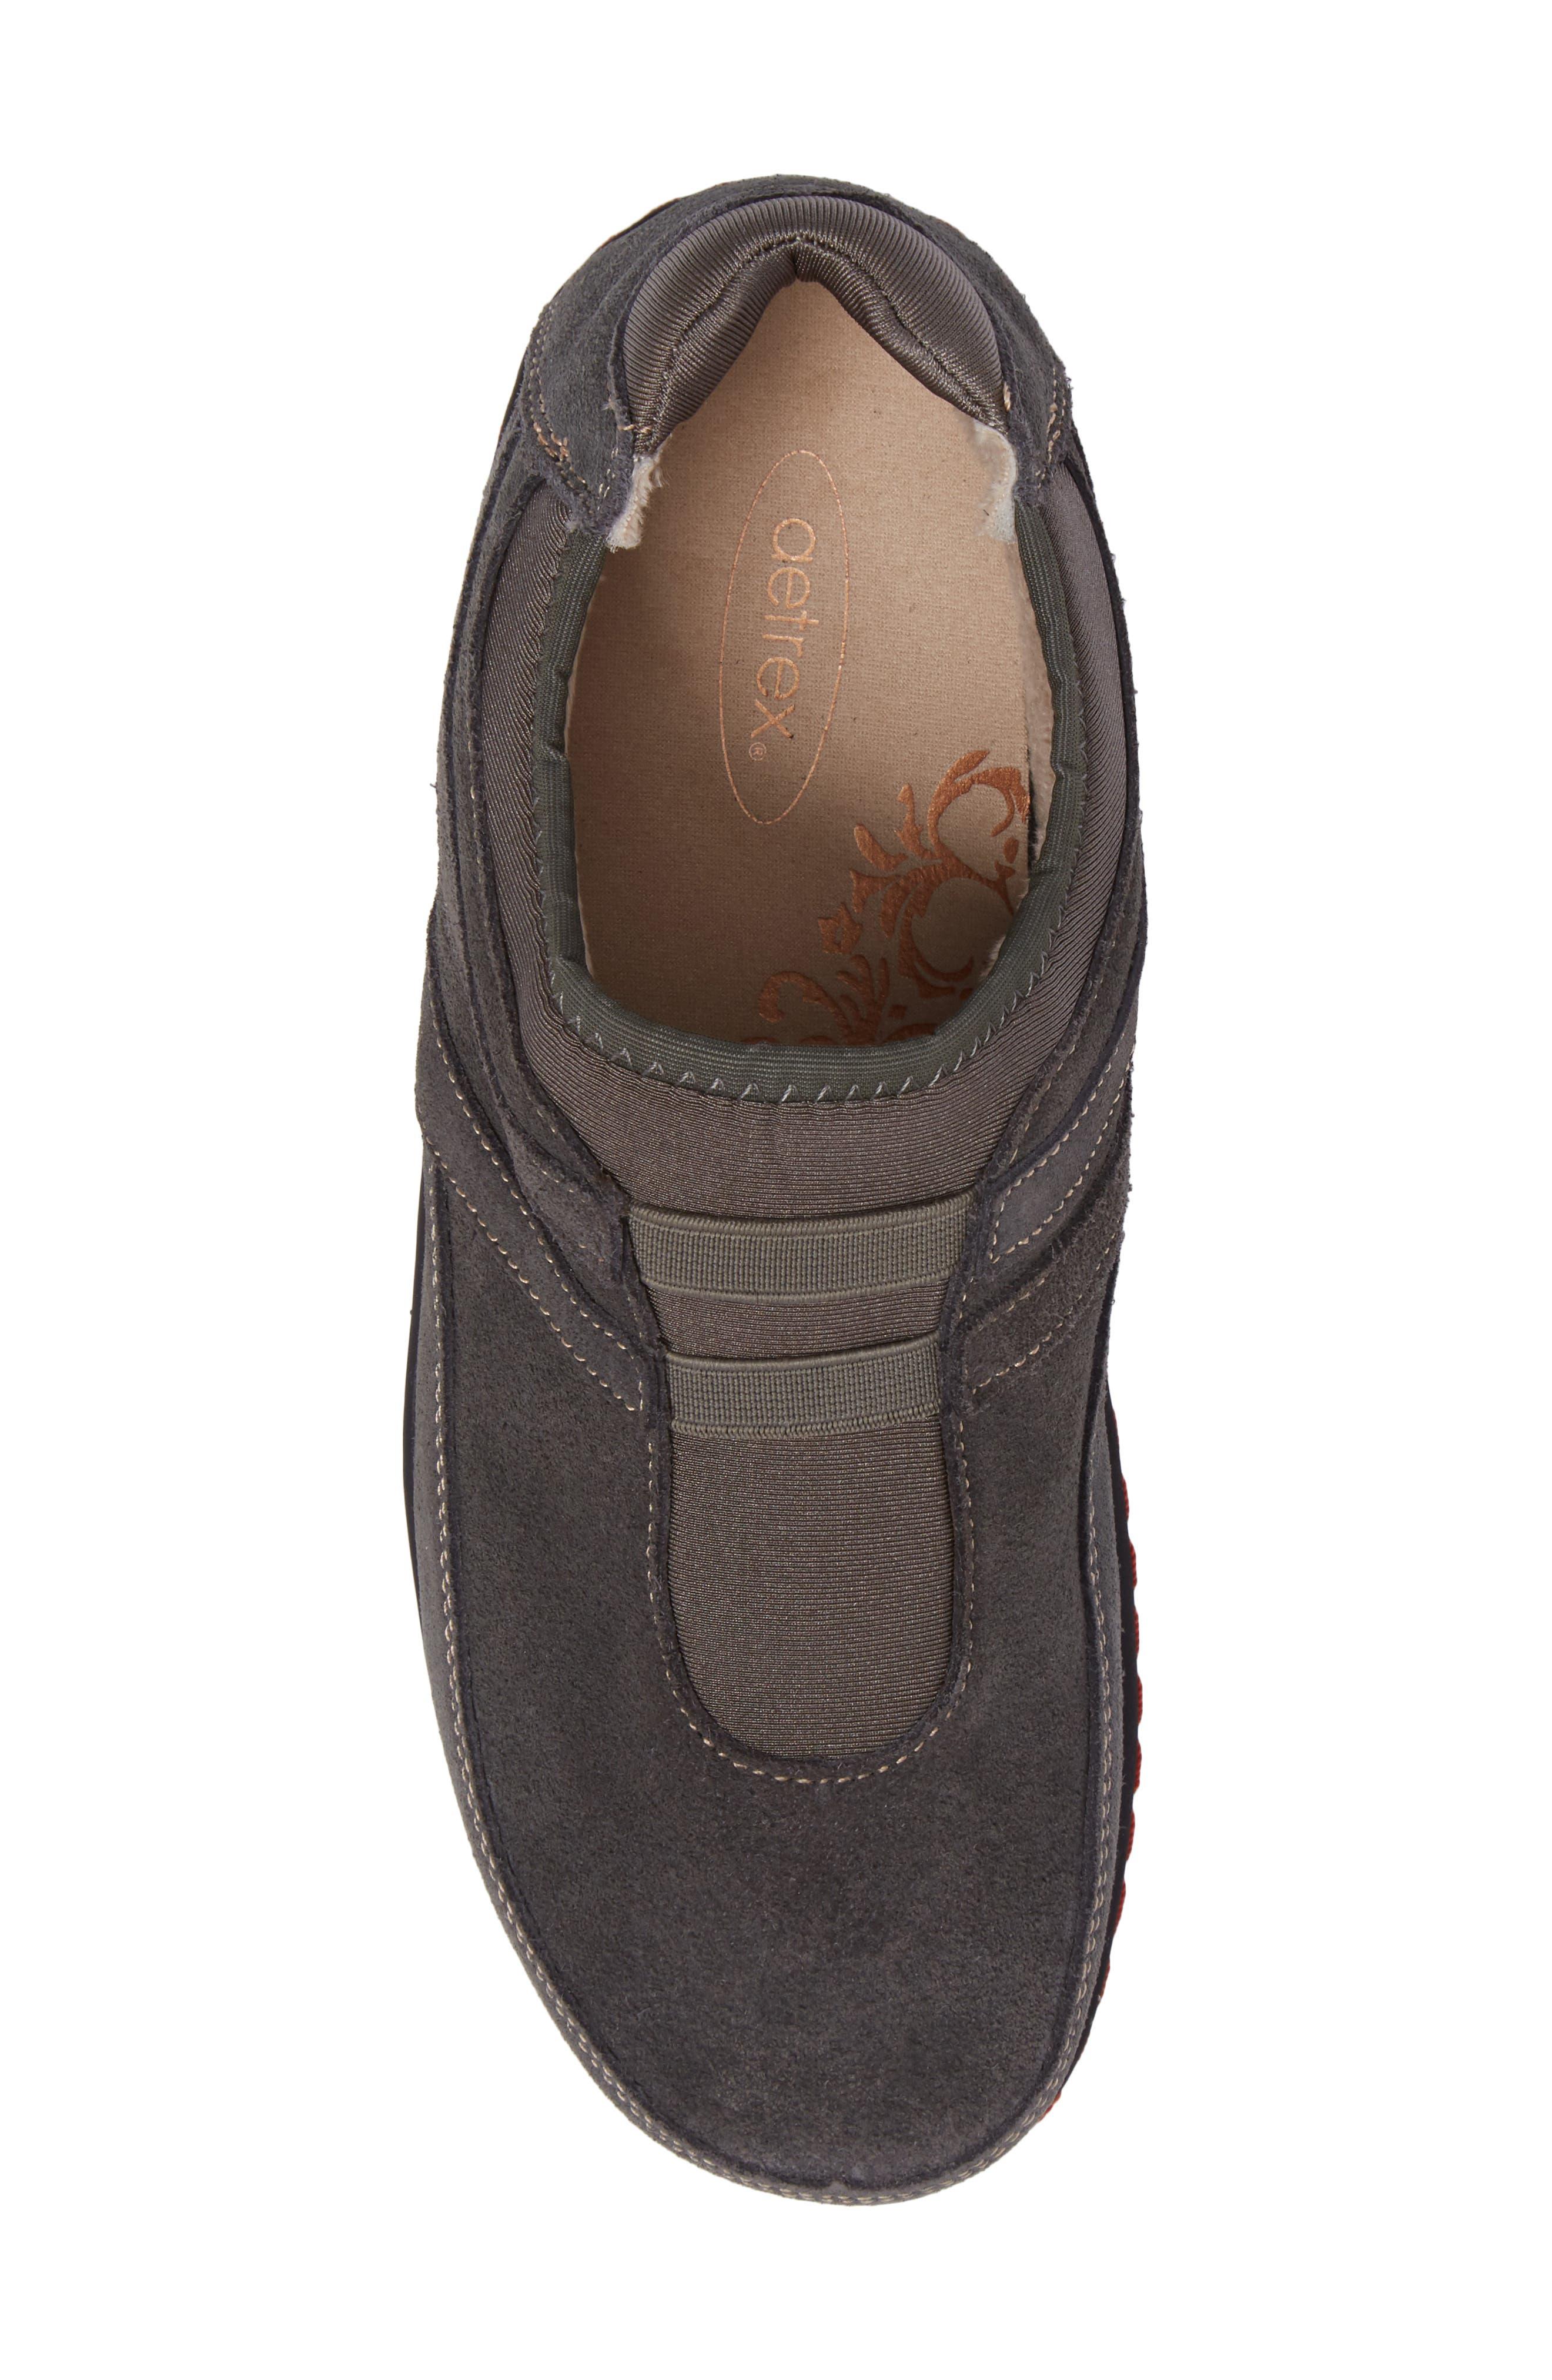 Berries Slip-On Sneaker,                             Alternate thumbnail 5, color,                             GREYBERRY SUEDE